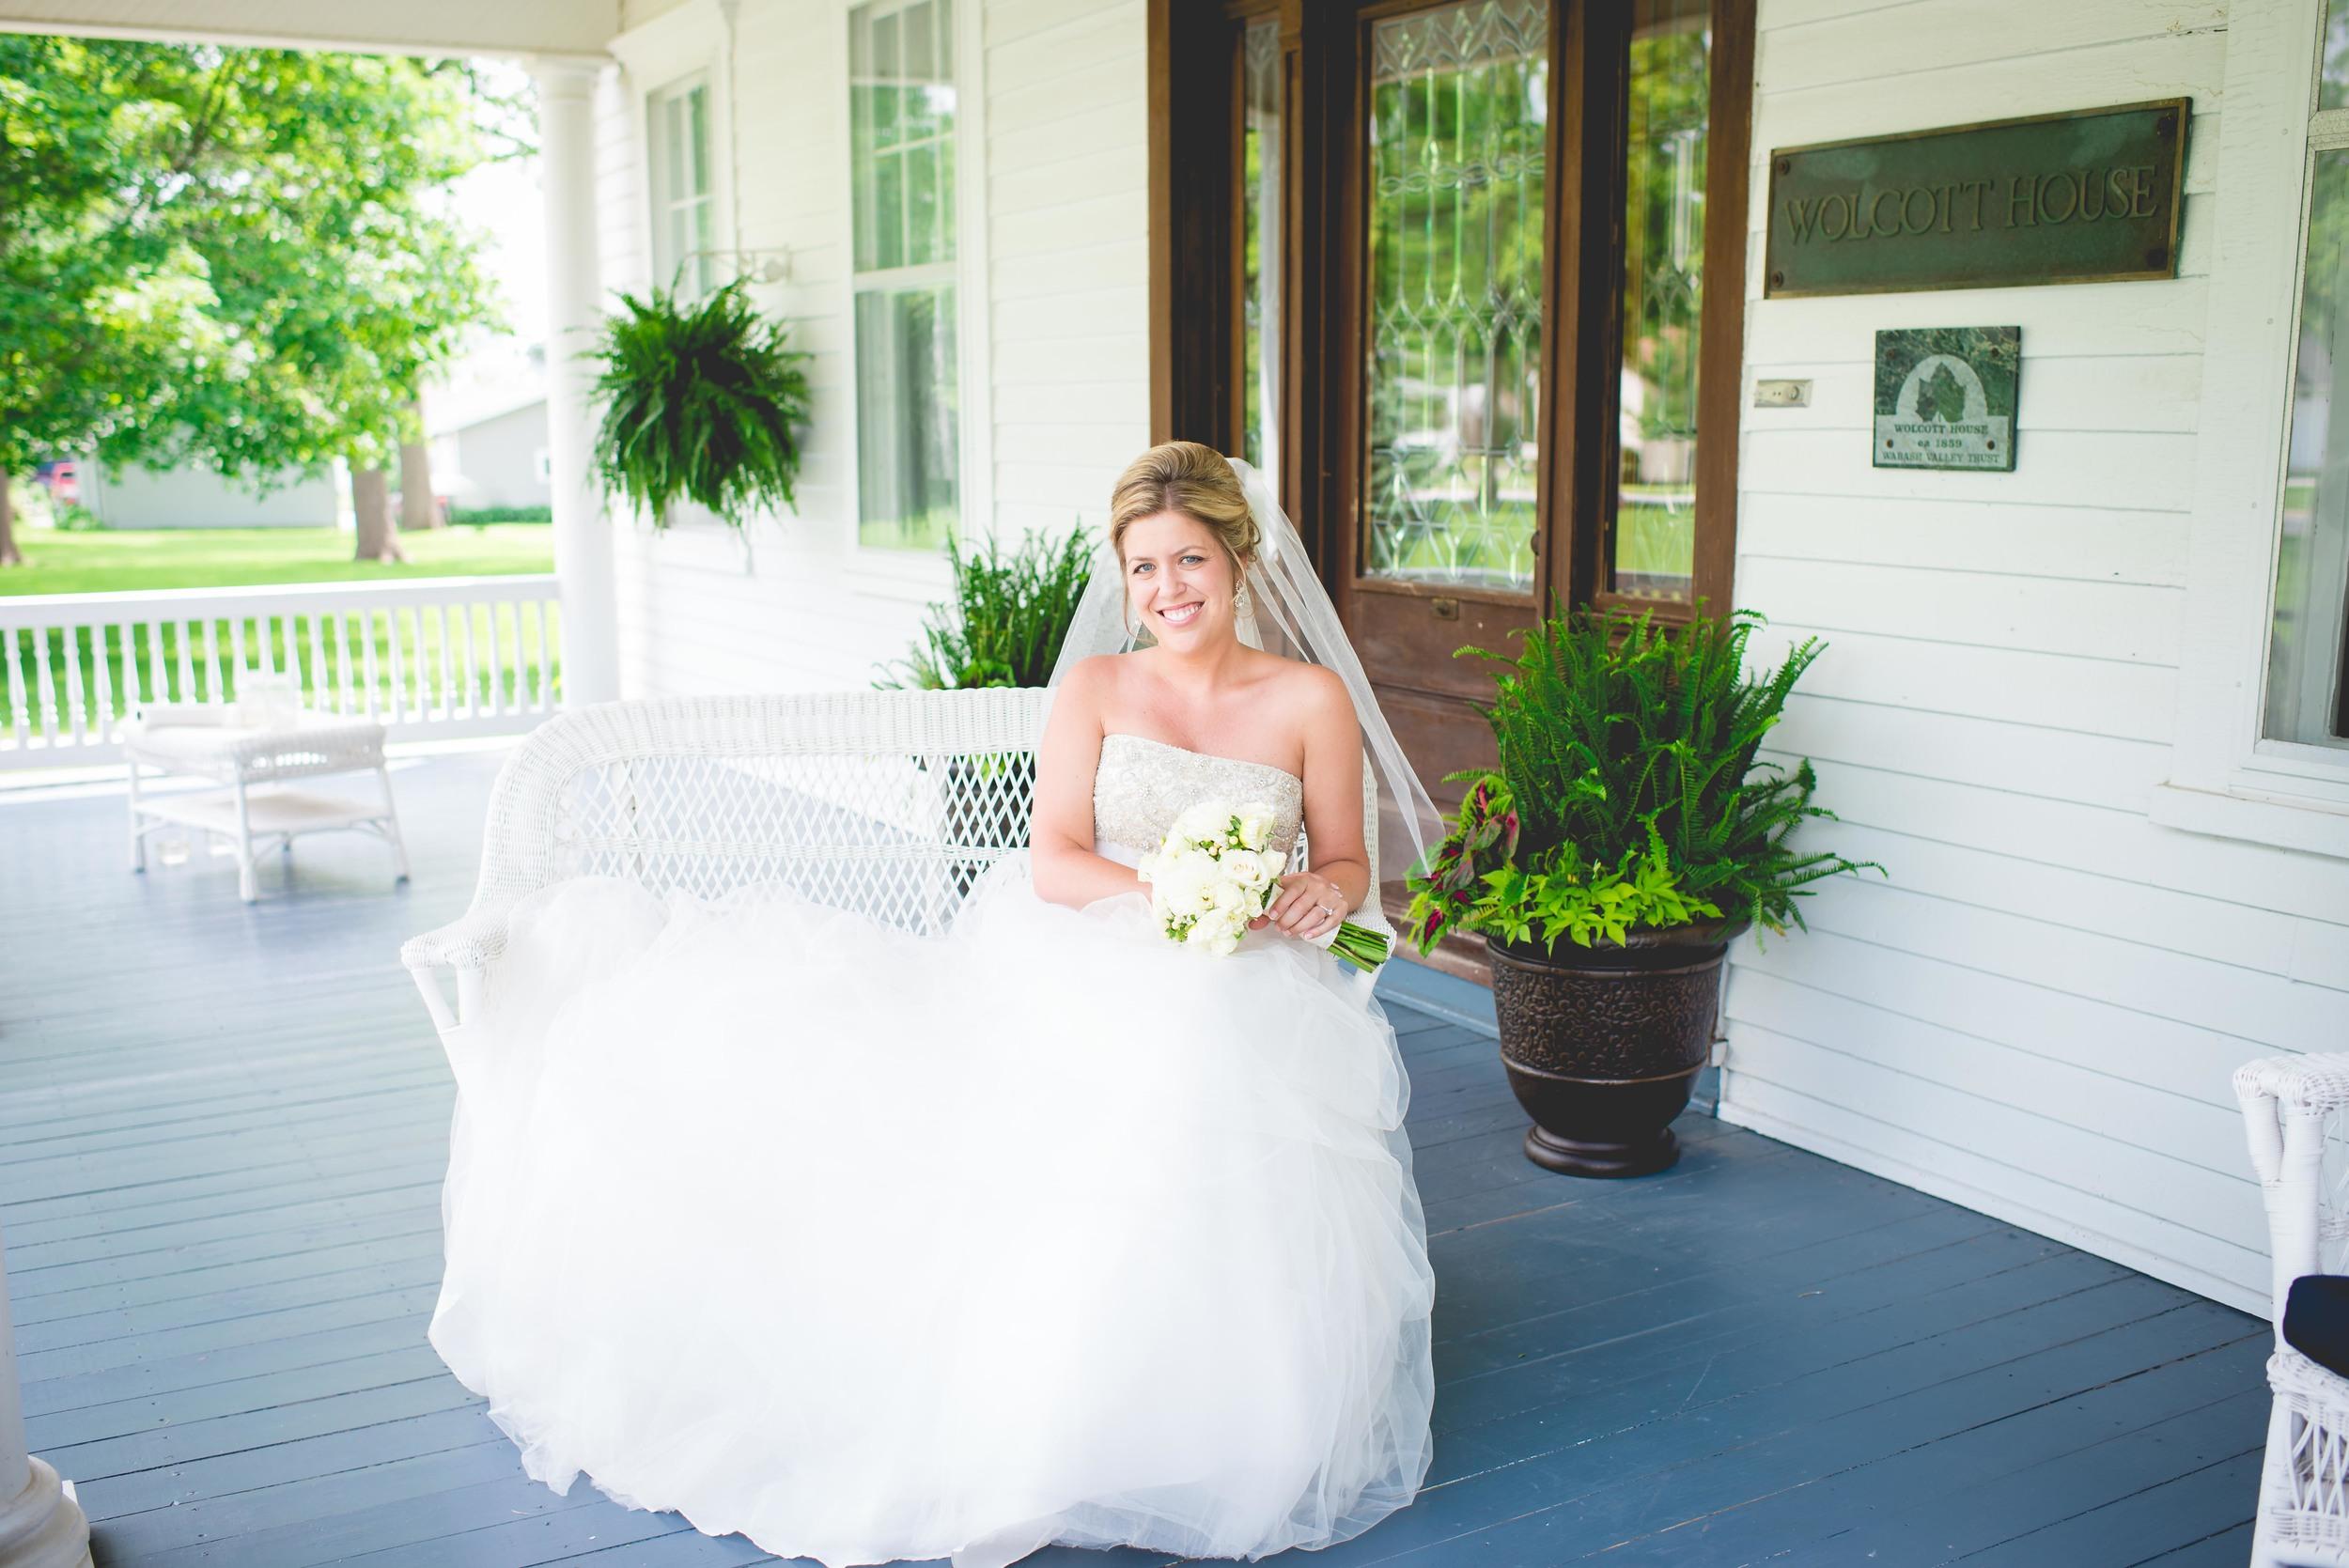 sarasutterphotography_leeandshalon_wedding_2015-217.jpg